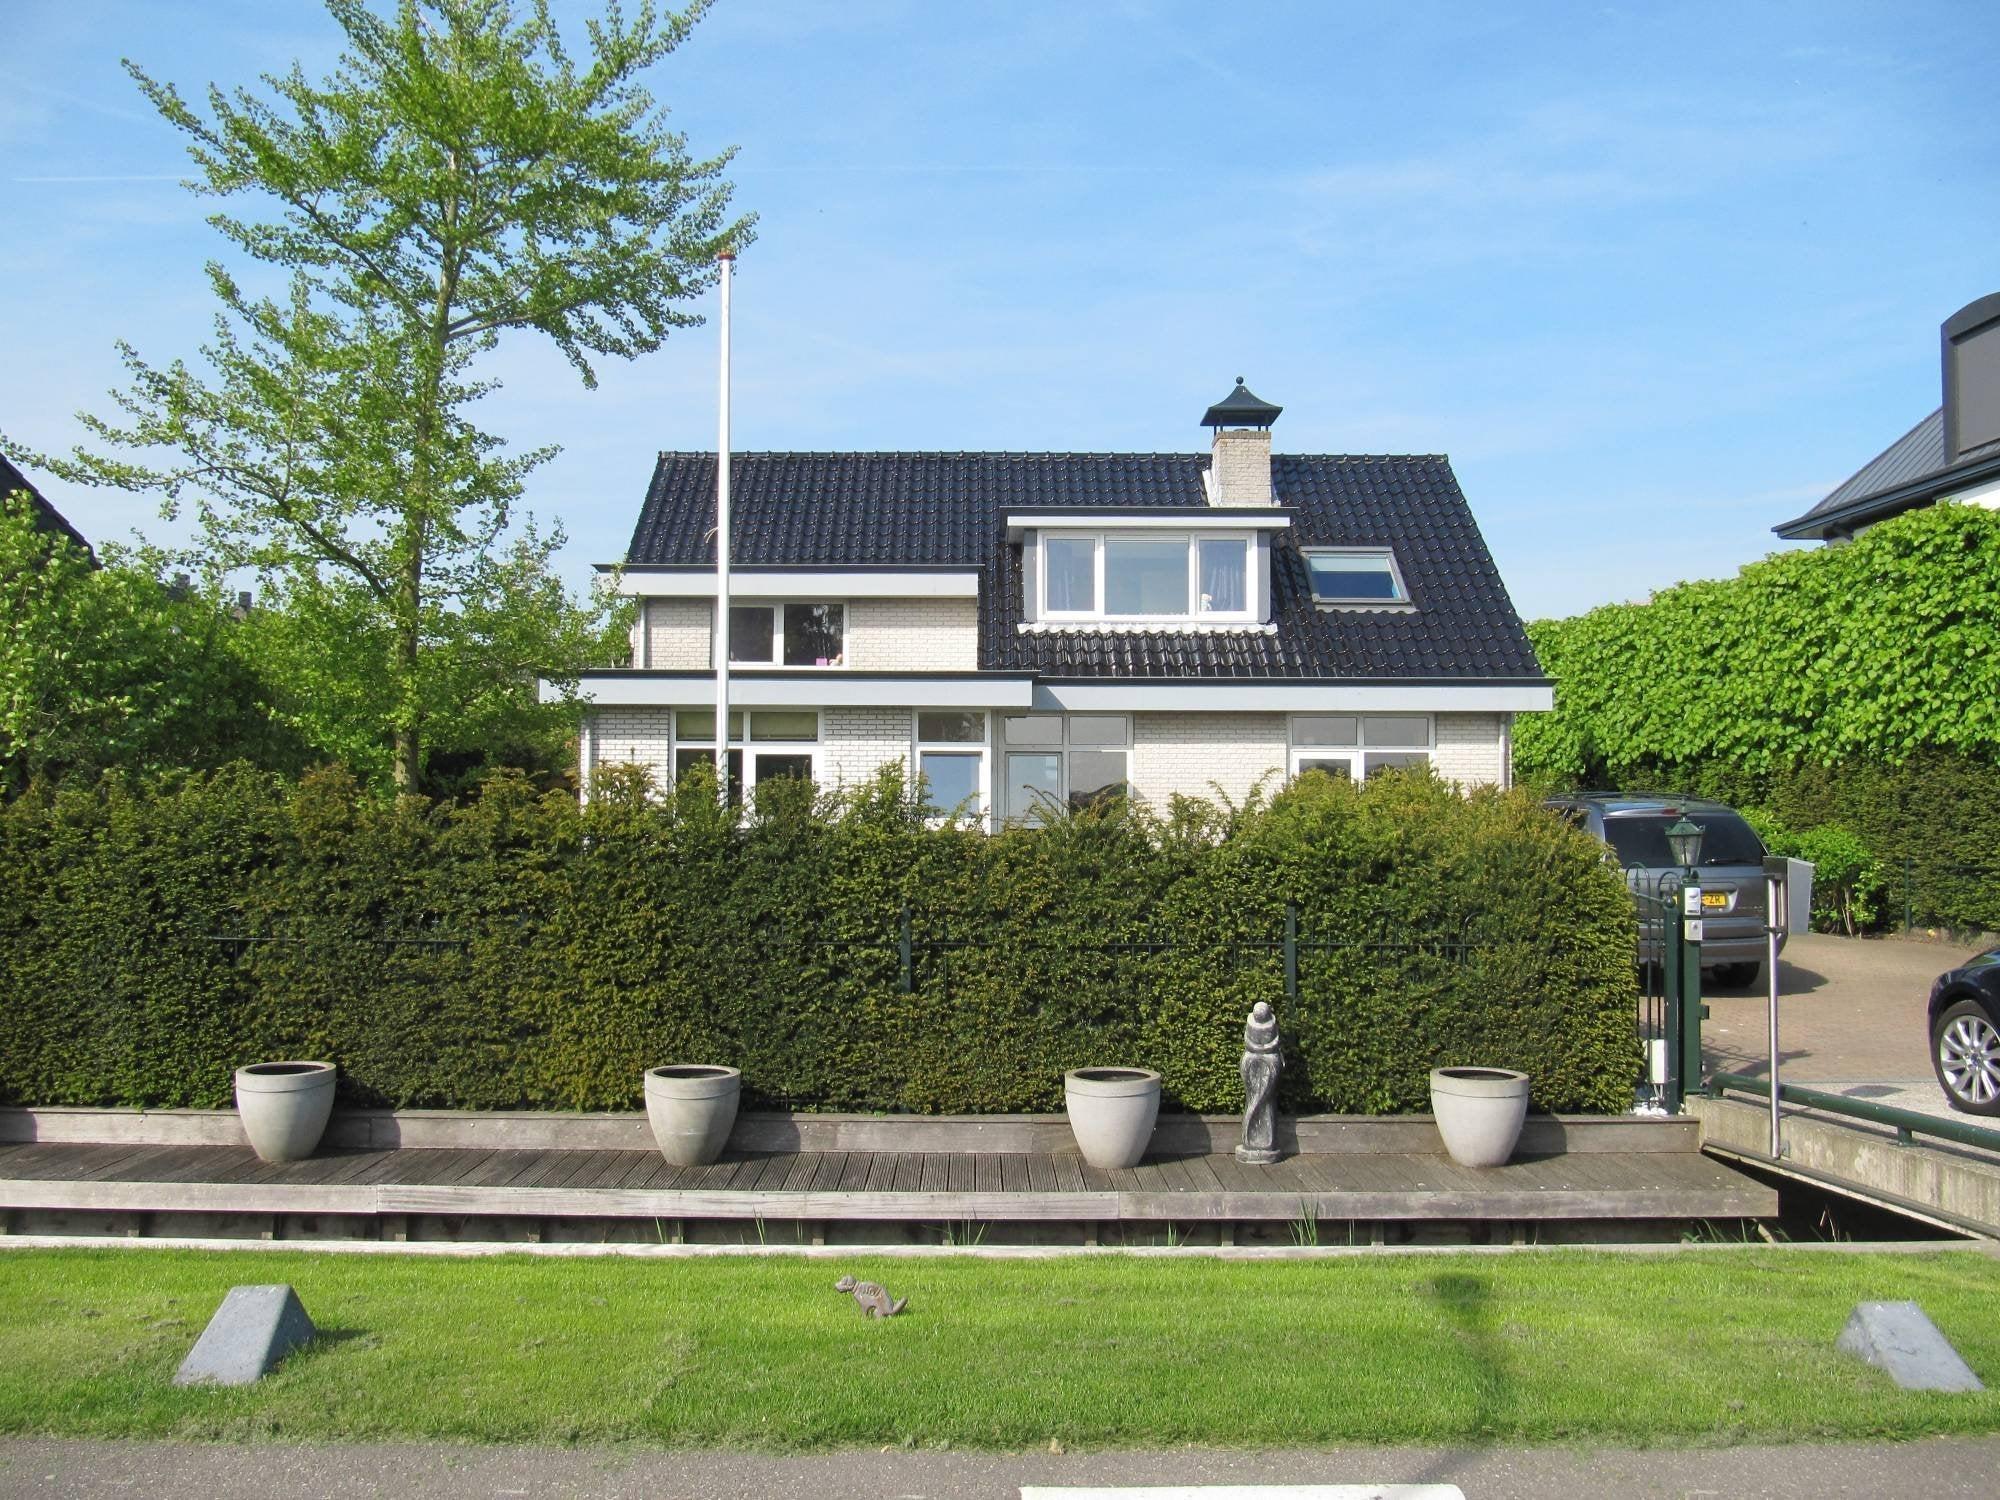 https://public.parariusoffice.nl/15/photos/huge/2481043.1399384682-168.JPG